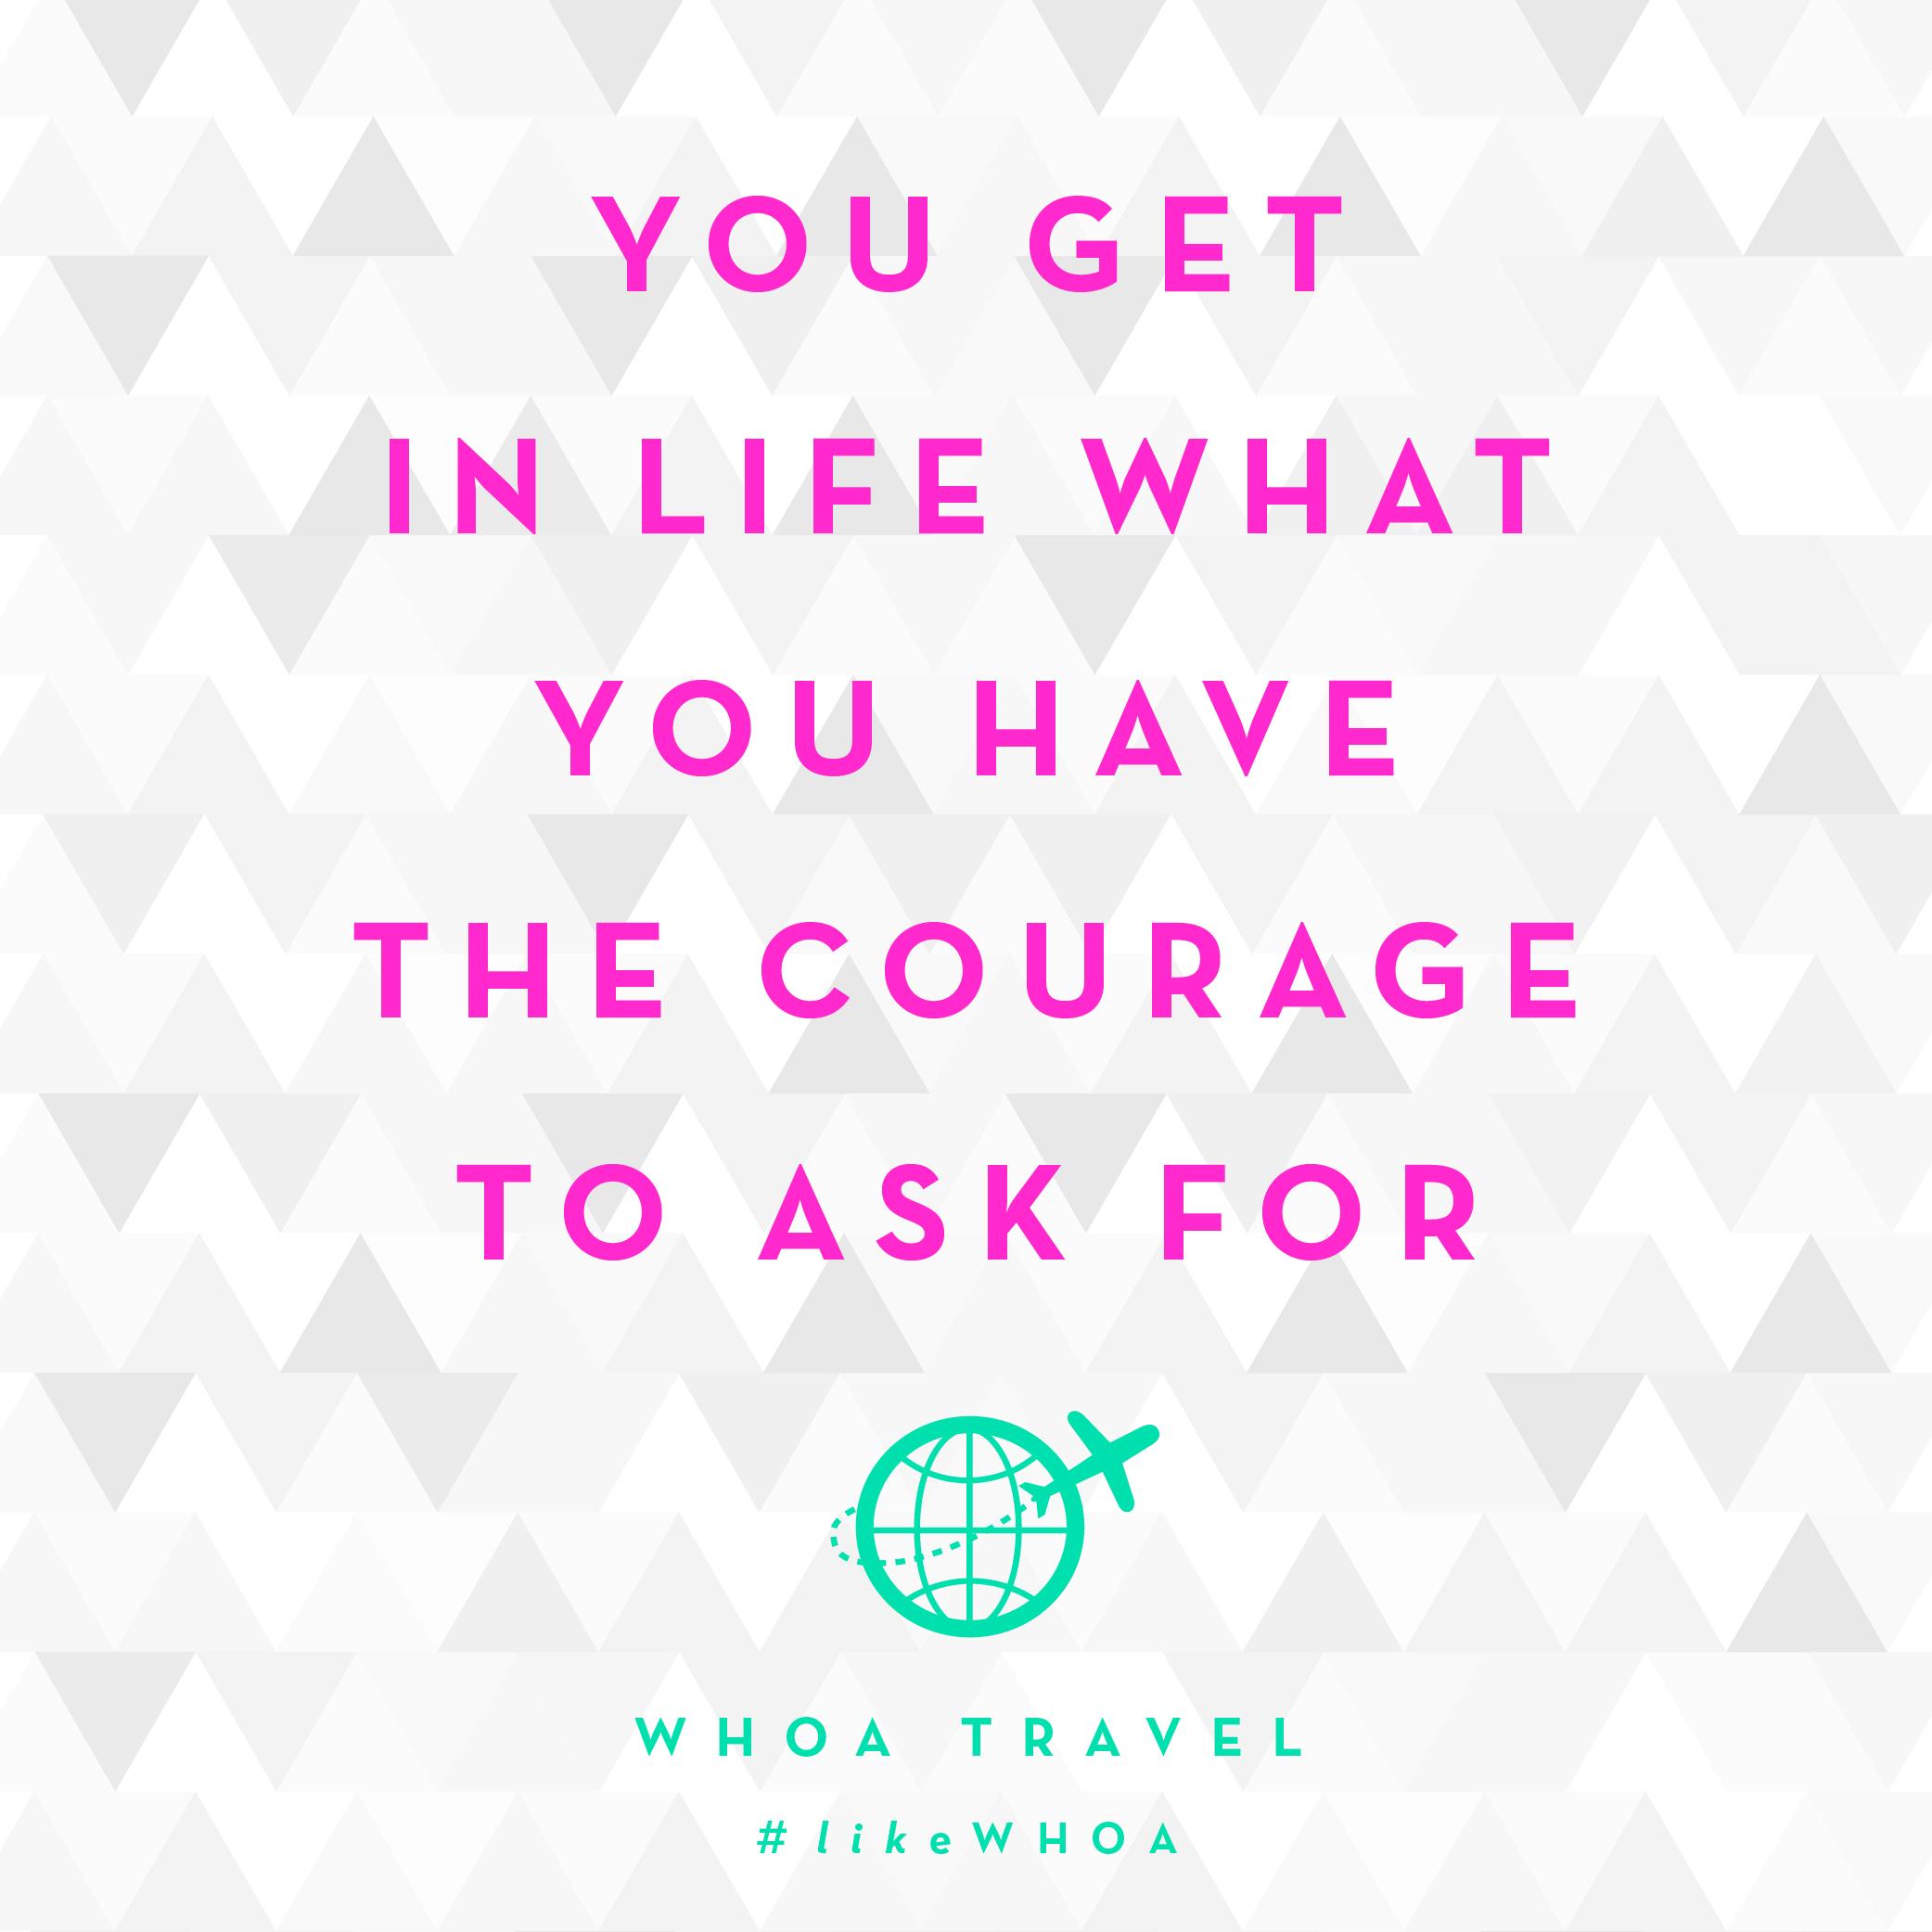 WHOA travel inspiration ADVENSPIRATION courage